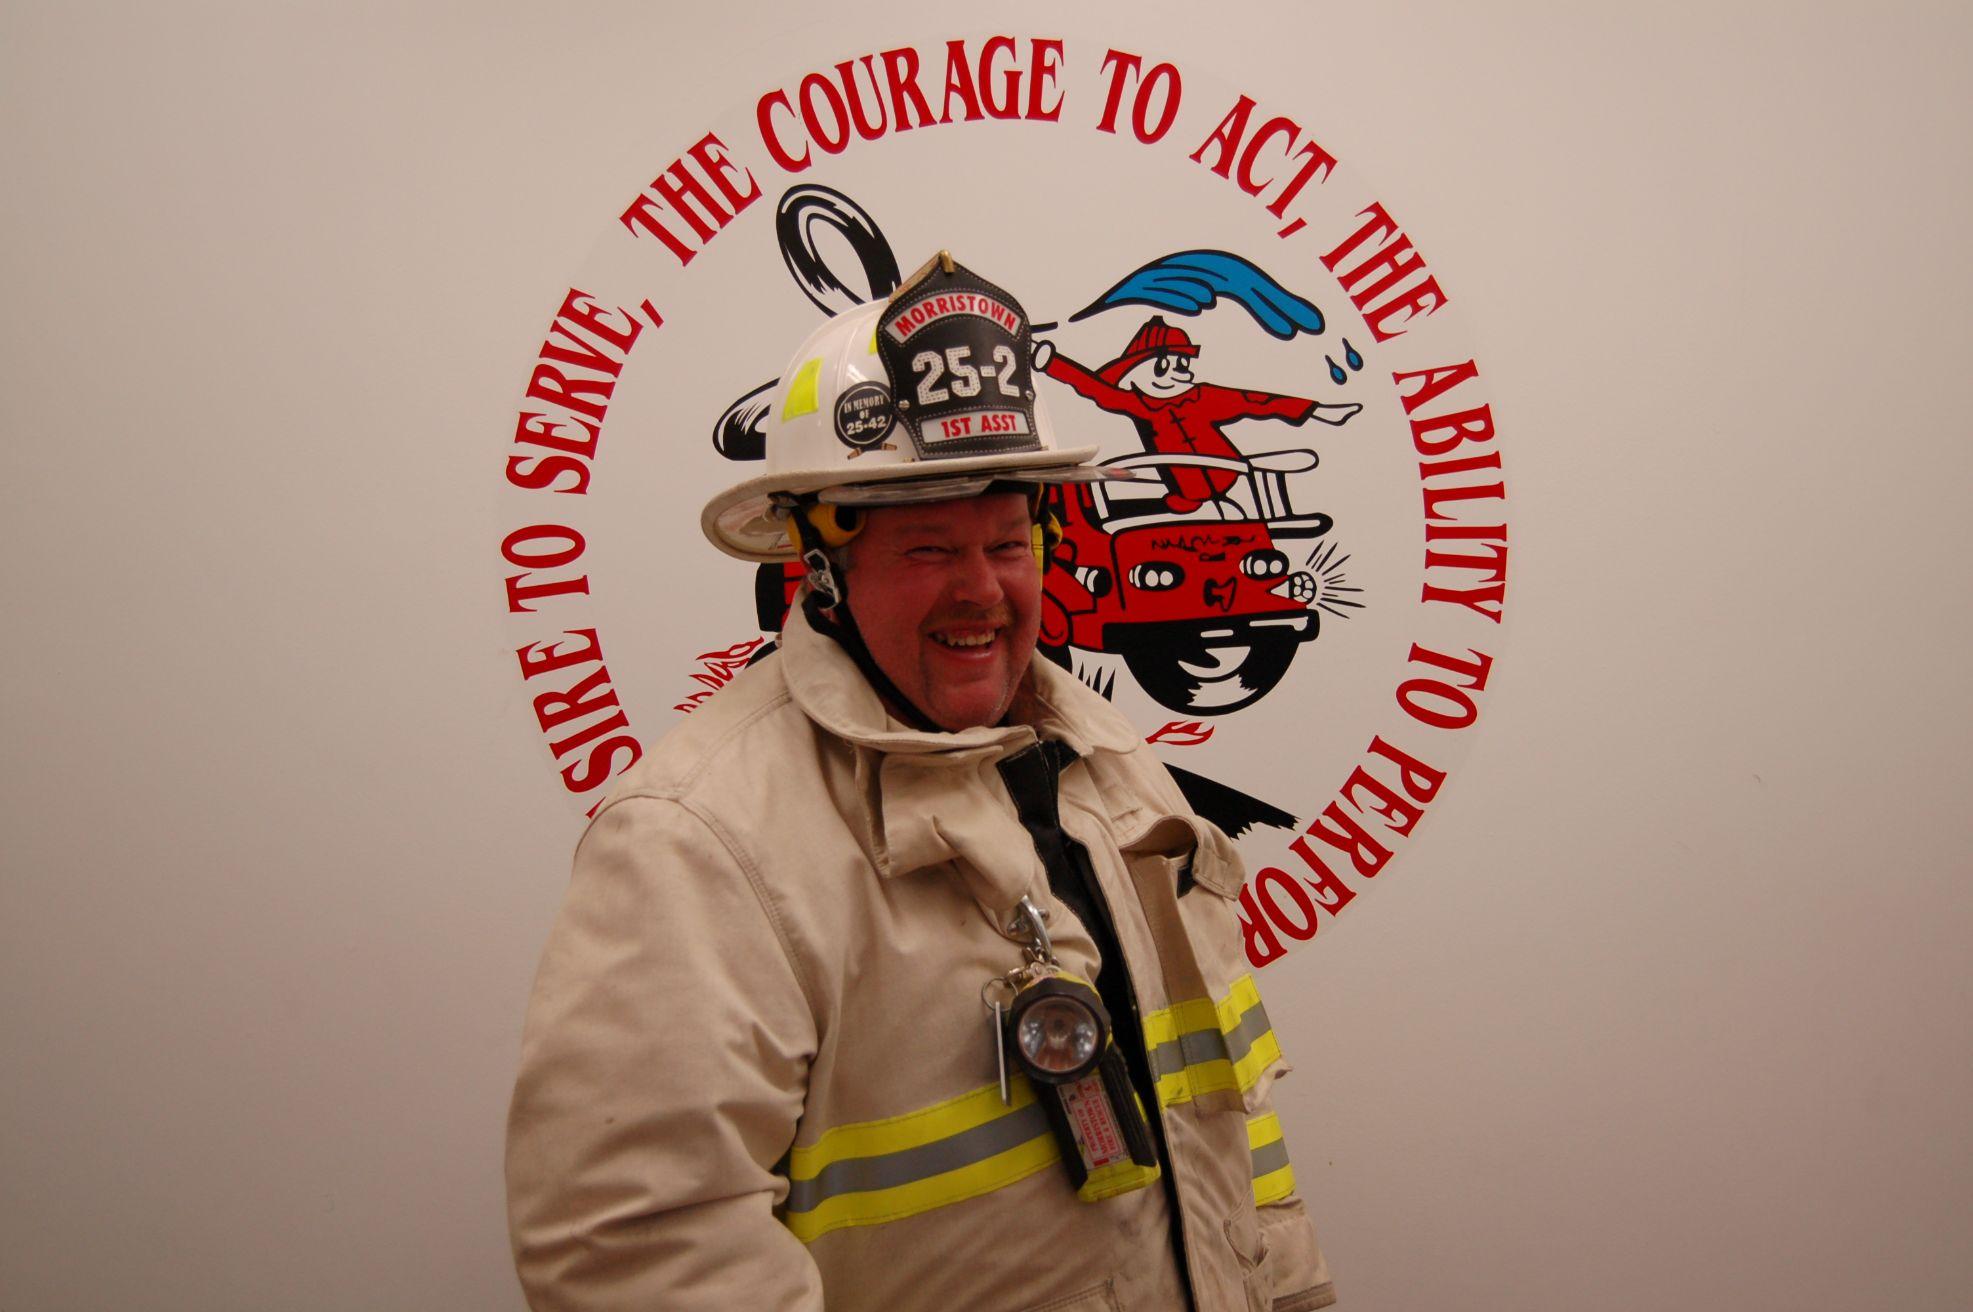 MVFD 1st Assistant Chief Ed Gagnon